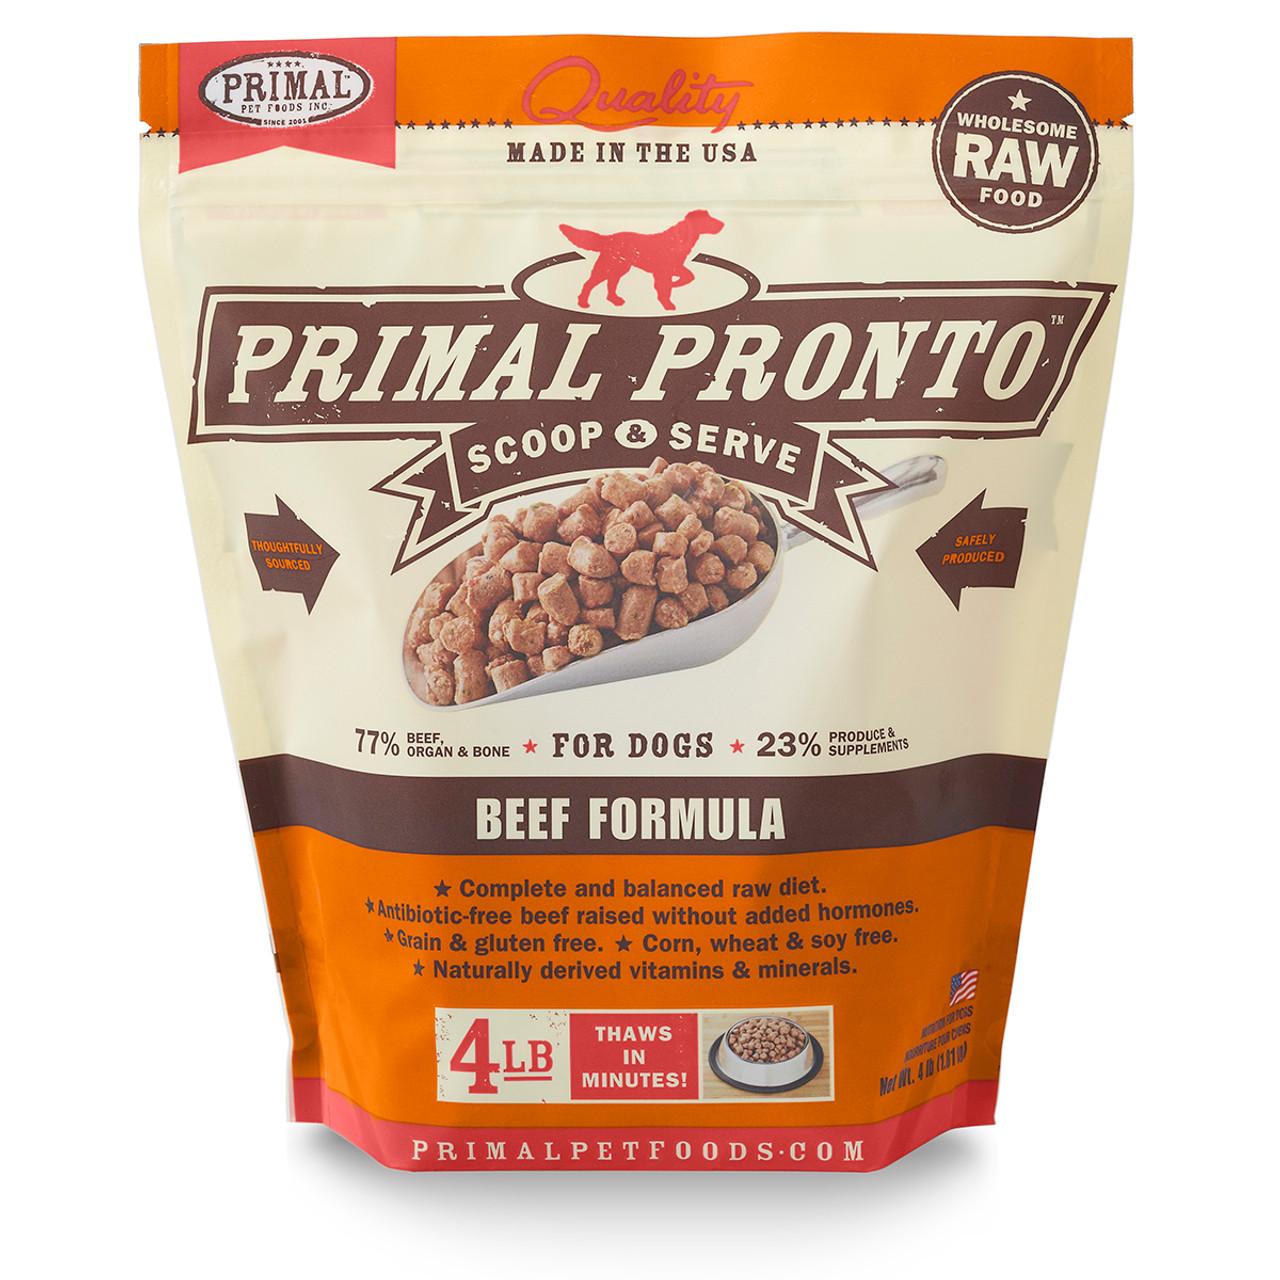 Primal Pronto Raw Frozen Canine Beef Formula Dog Food